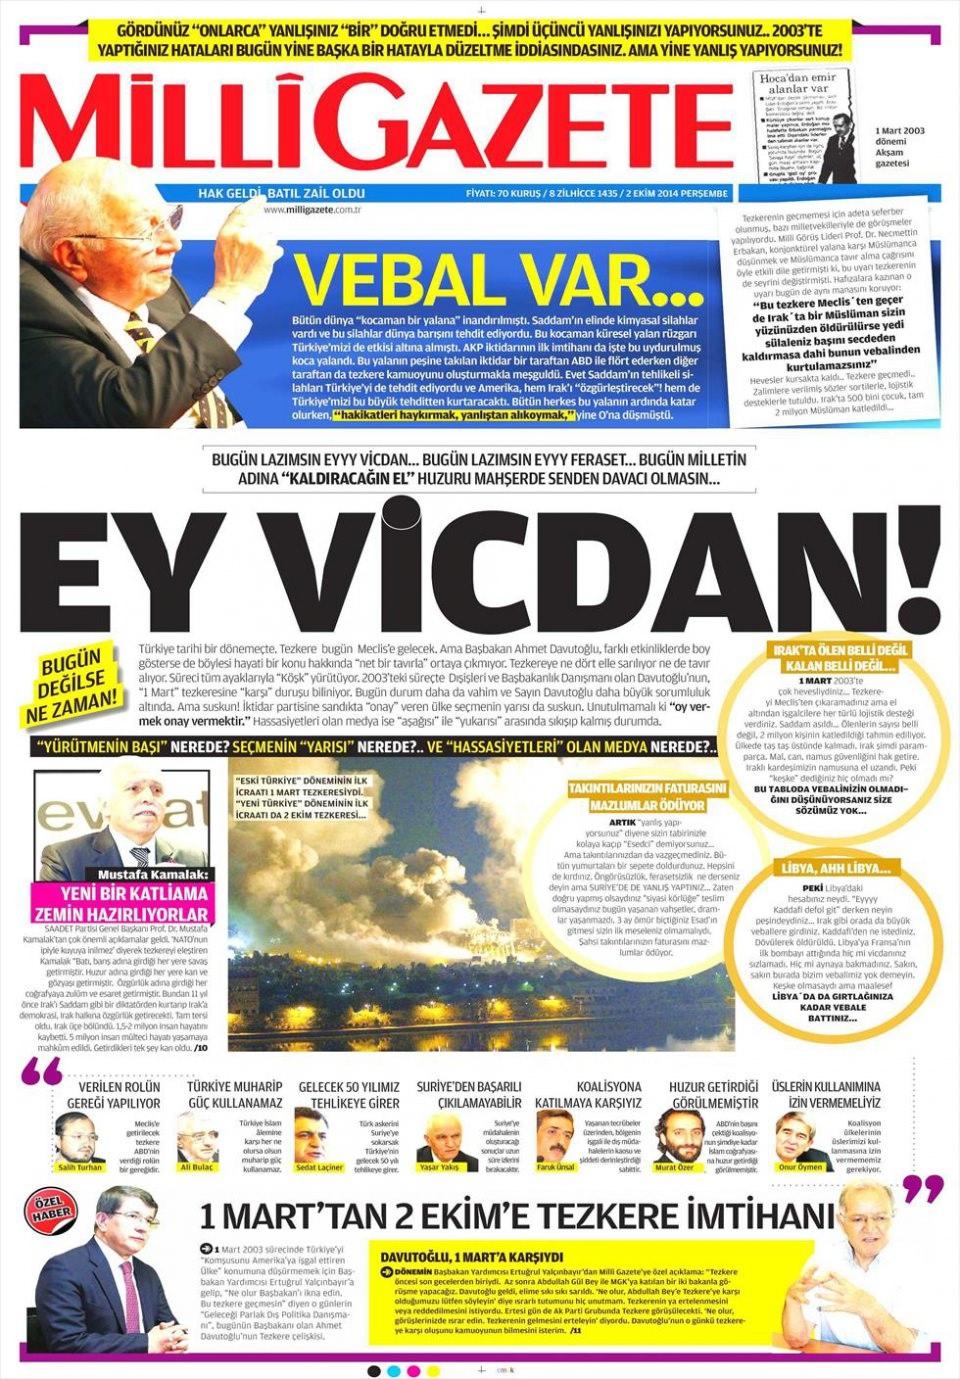 2 Ekim 2014 gazete manşetleri 11